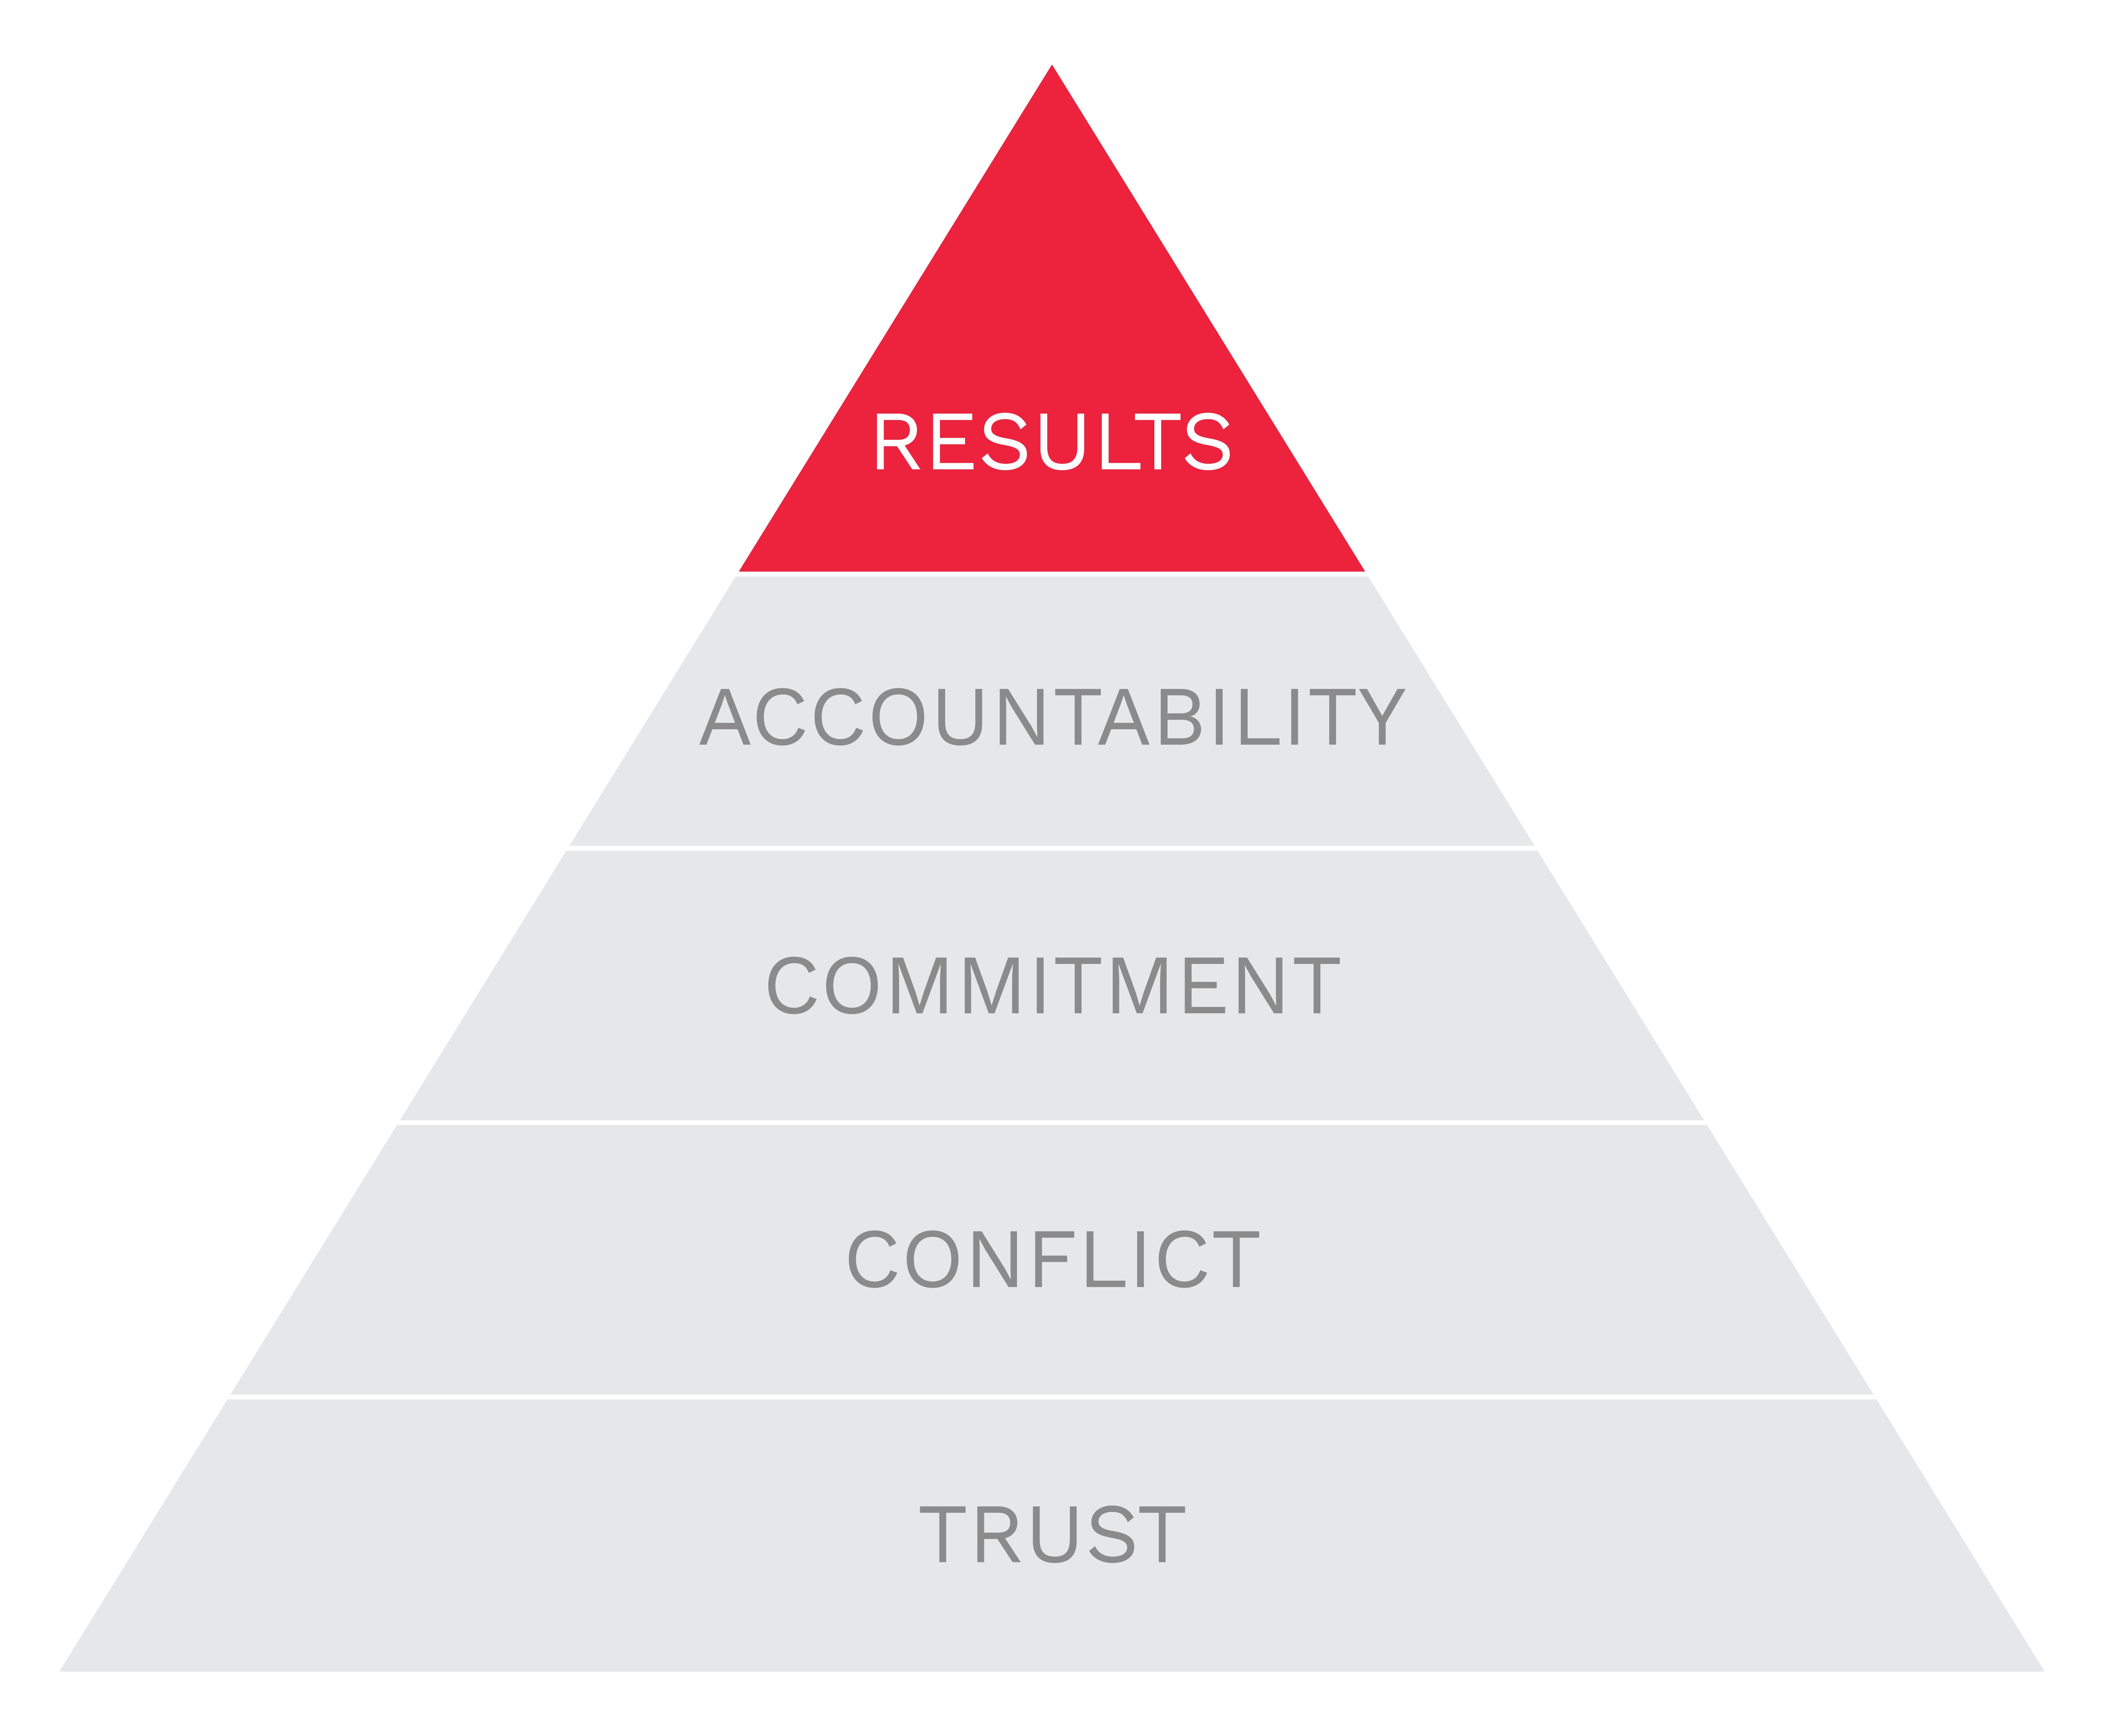 5b-branding-pyramid-results.png